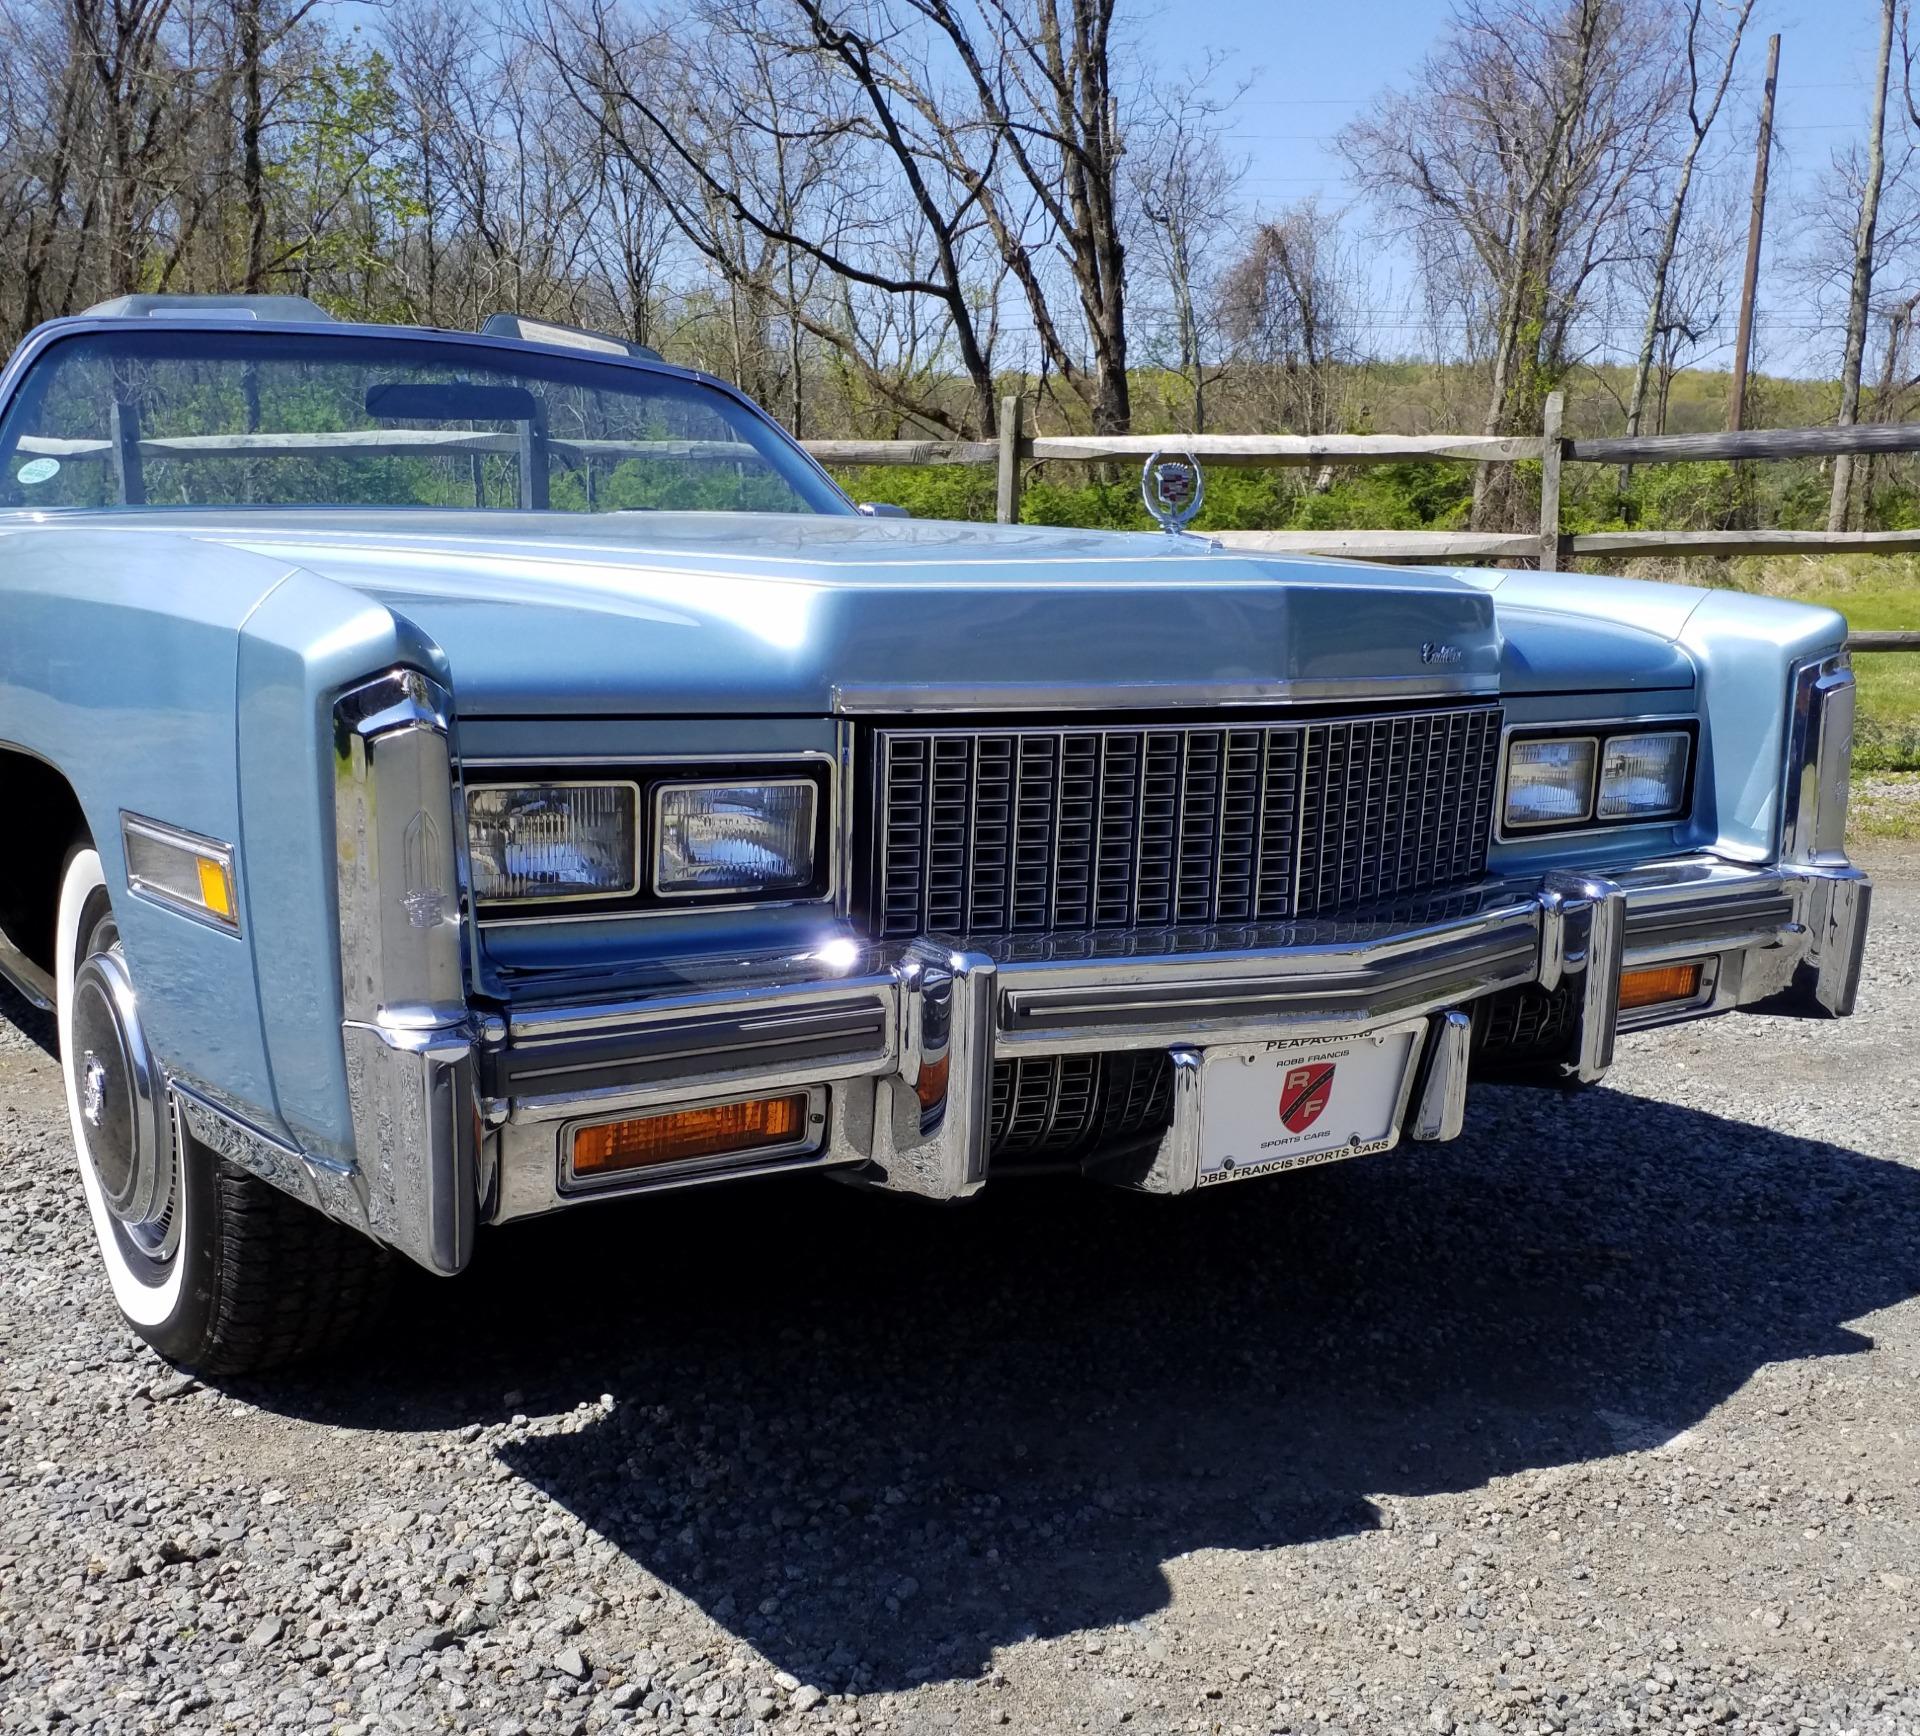 1976 Cadillac El Dorado Stock # 2551 For Sale Near Peapack